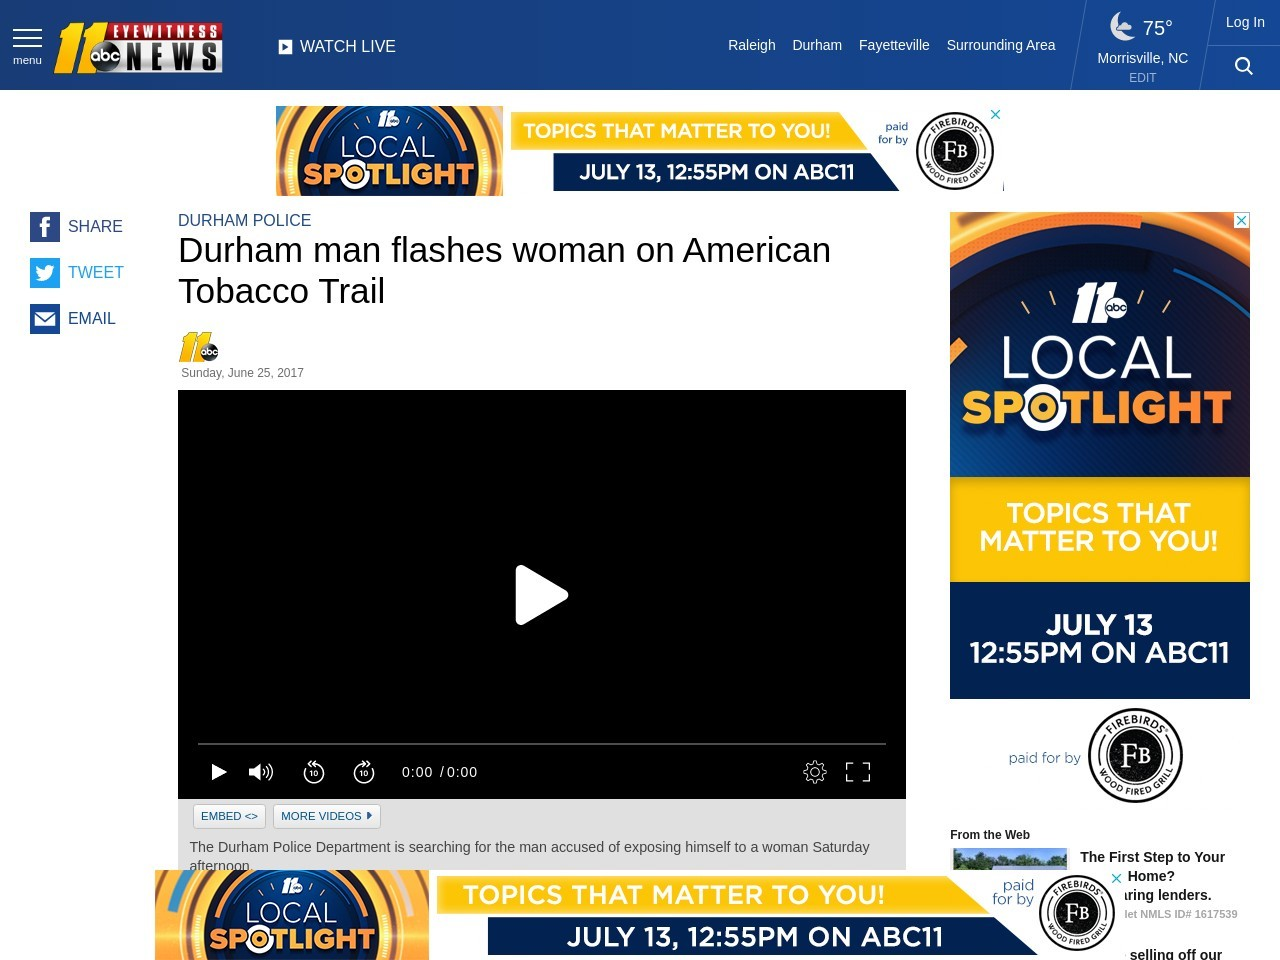 Durham man flashes woman on American Tobacco Trail